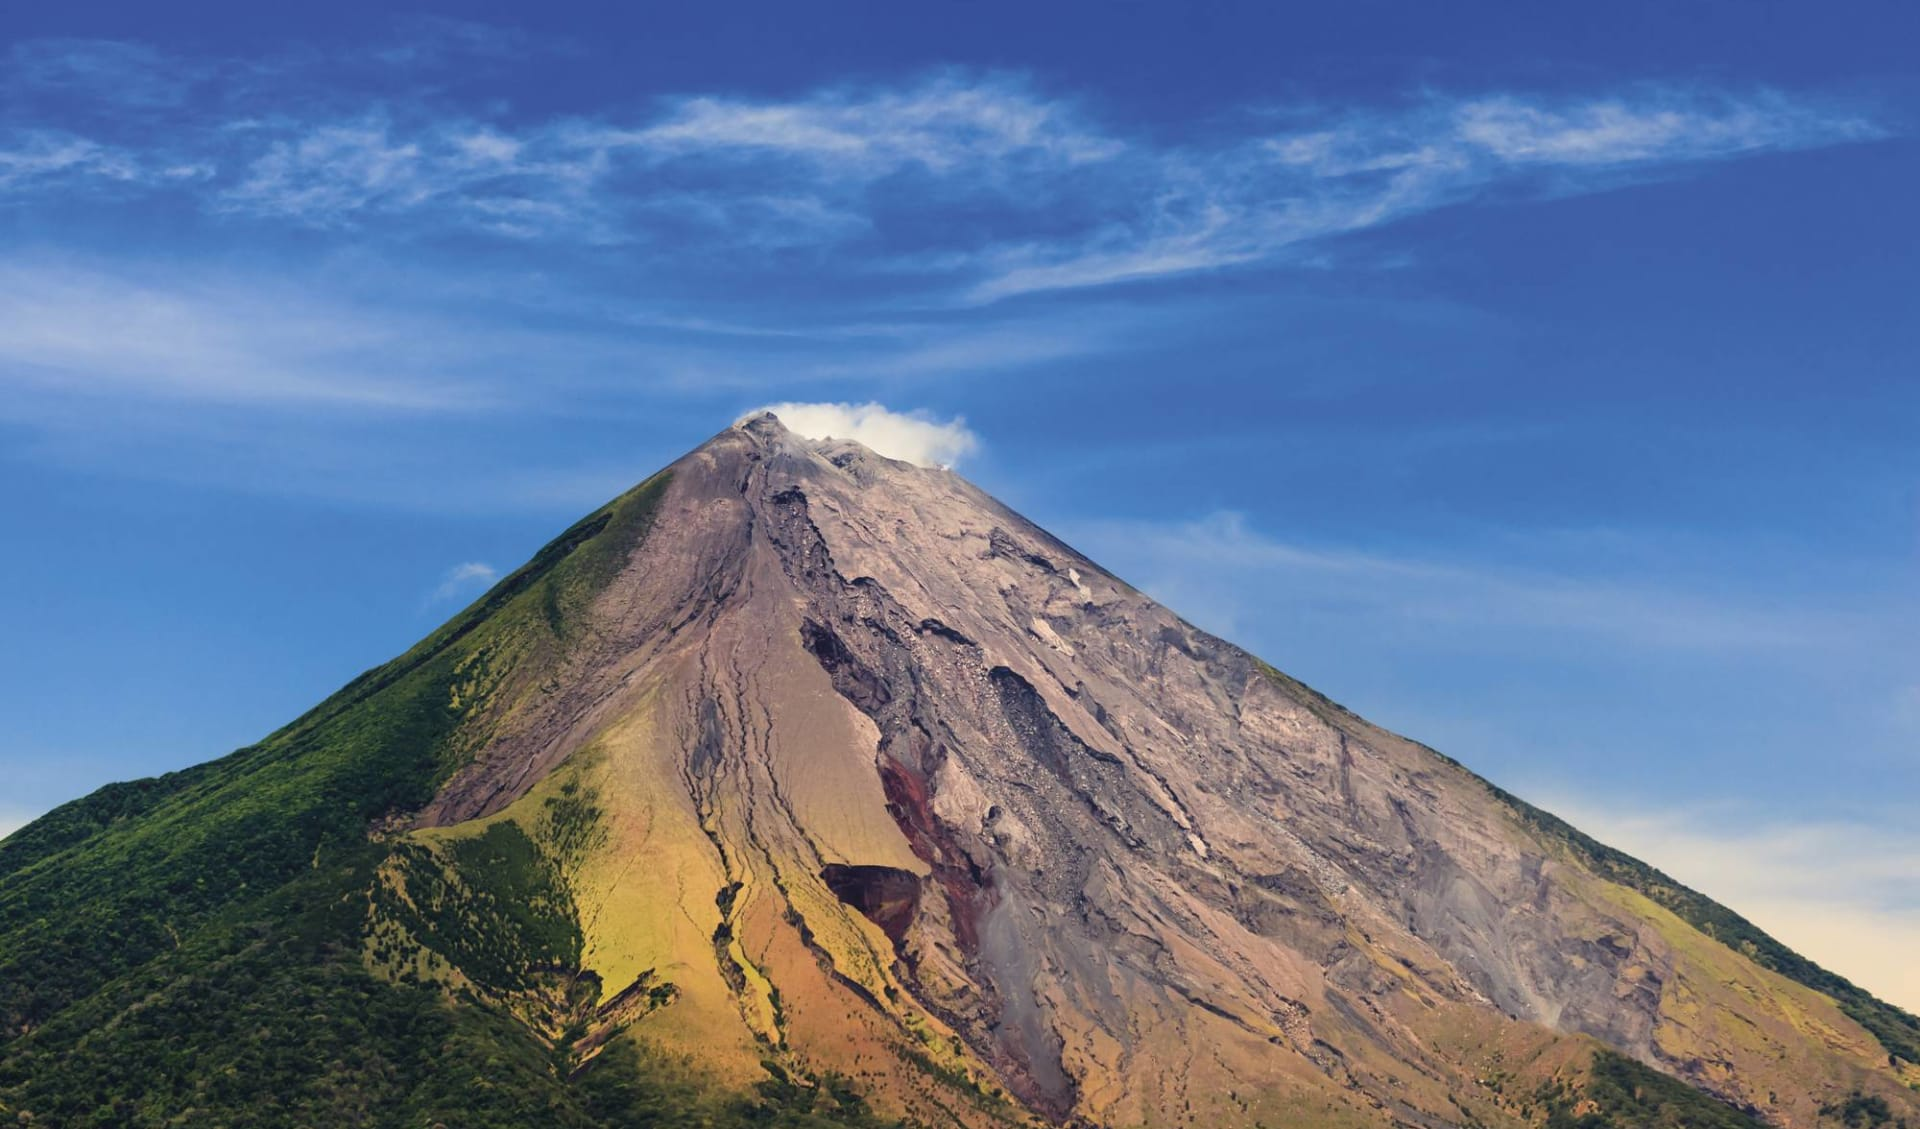 Gruppenreise Höhepunkte Nicaragua ab Managua: Nicaragua - Vulkan Ometepe - Blick auf farbigen Vulkan